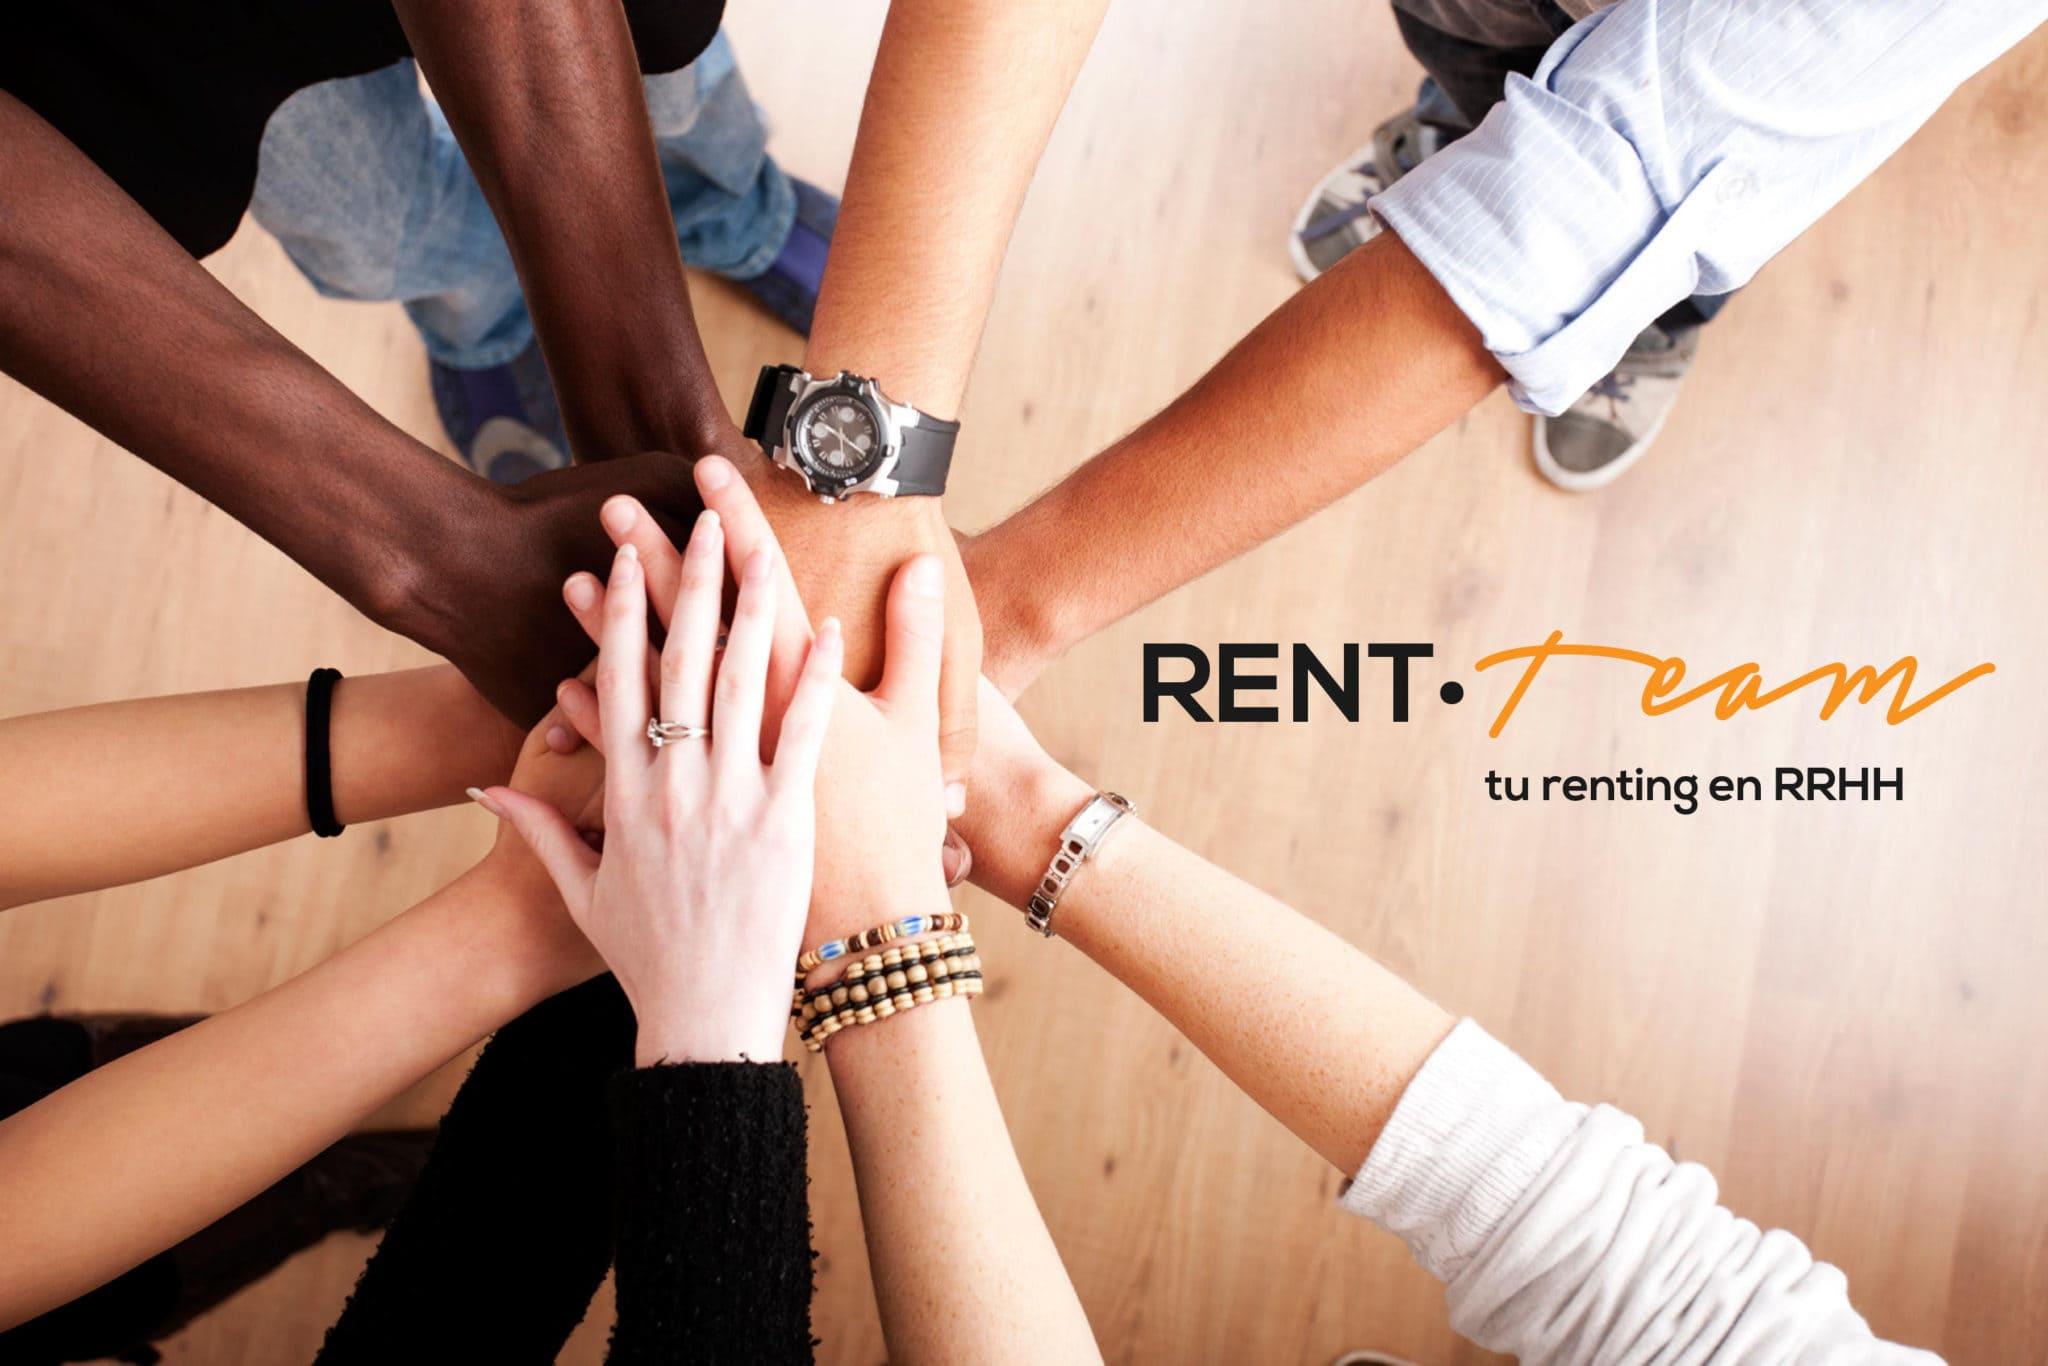 Hablemos del renting en RRHH